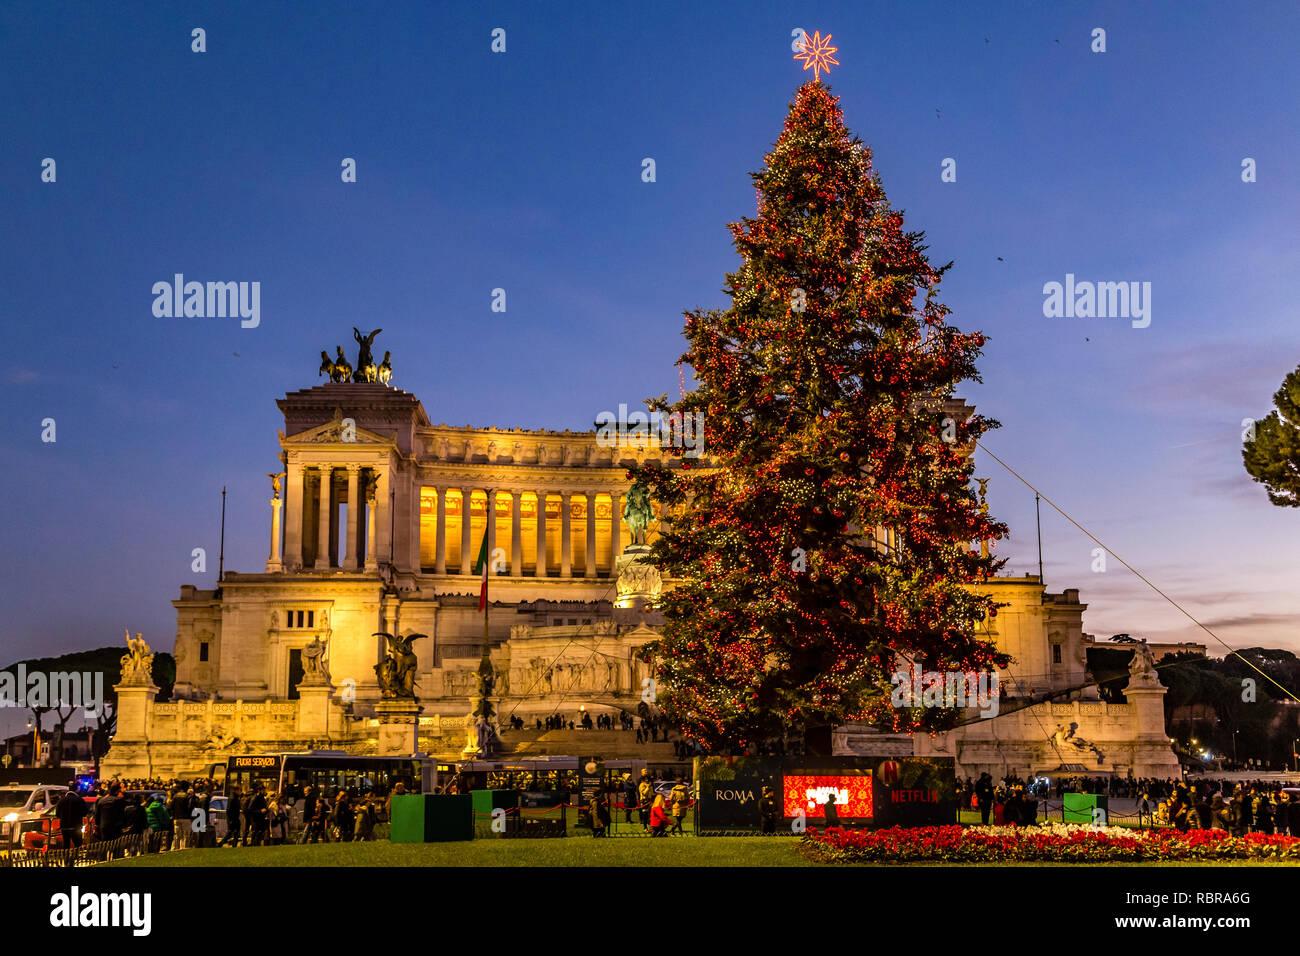 Christmas In Italy 2019.Rome Italy January 1 2019 Tourists Walking Near Altar